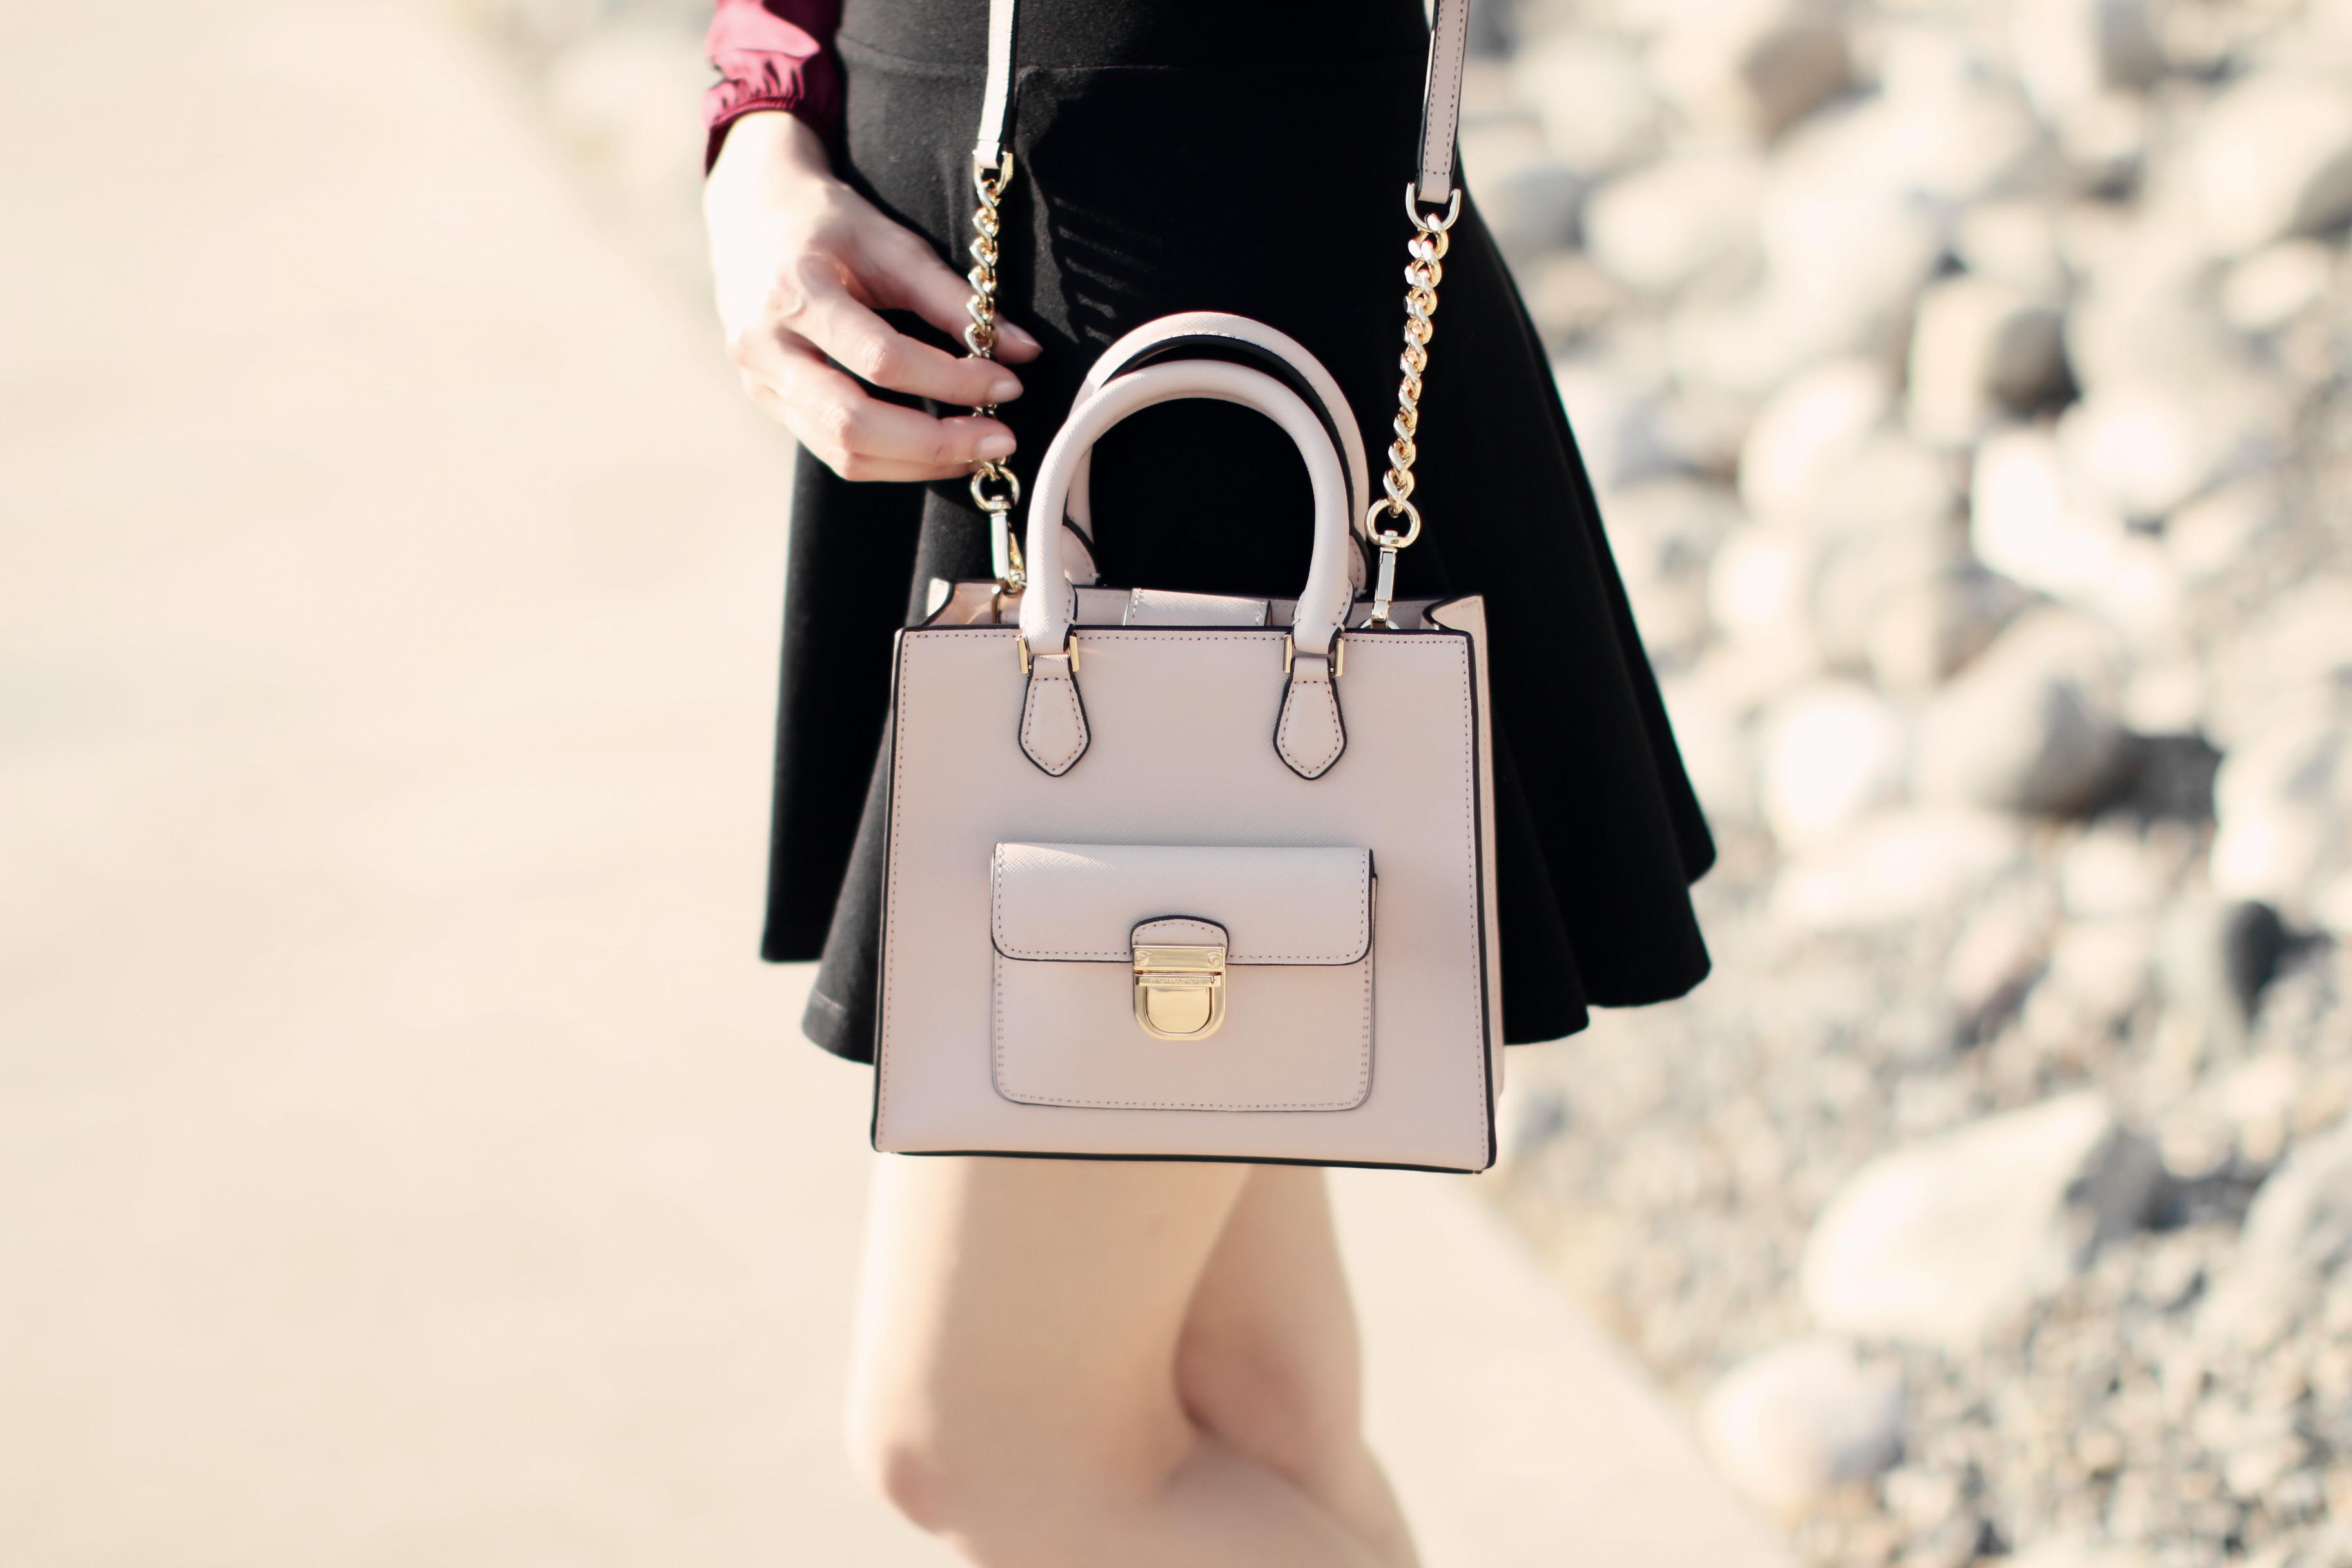 3609-ootd-fashion-style-outfitoftheday-wiwt-michaelkors-fallfashion-forever21-f21xme-elizabeeetht-clothestoyouuu